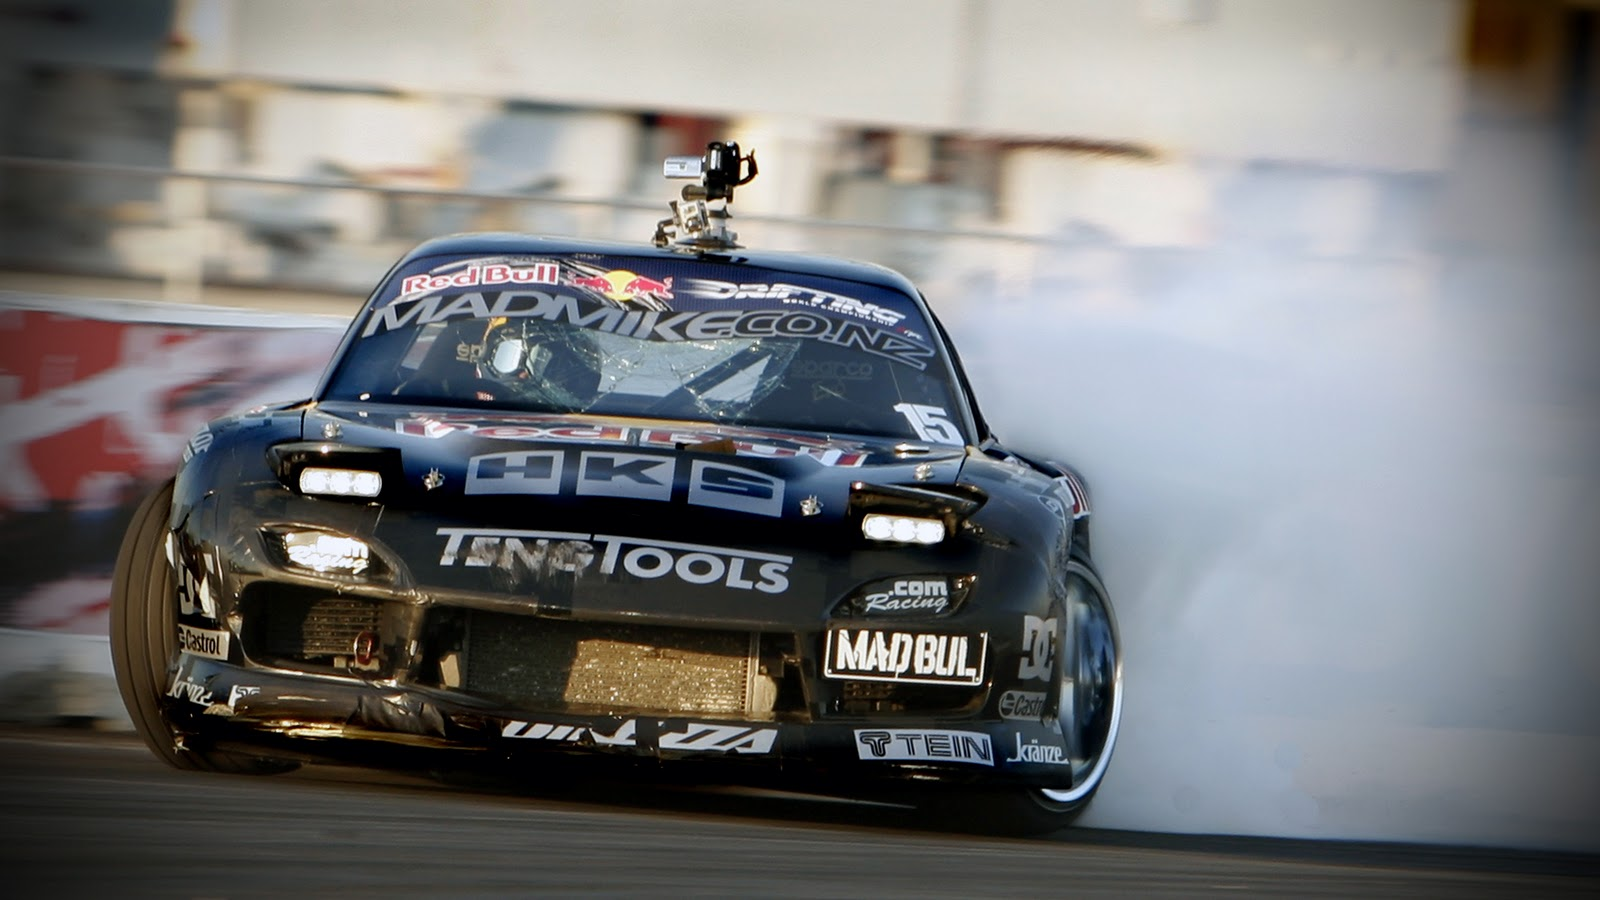 race cars wallpaper - Cars Magazine